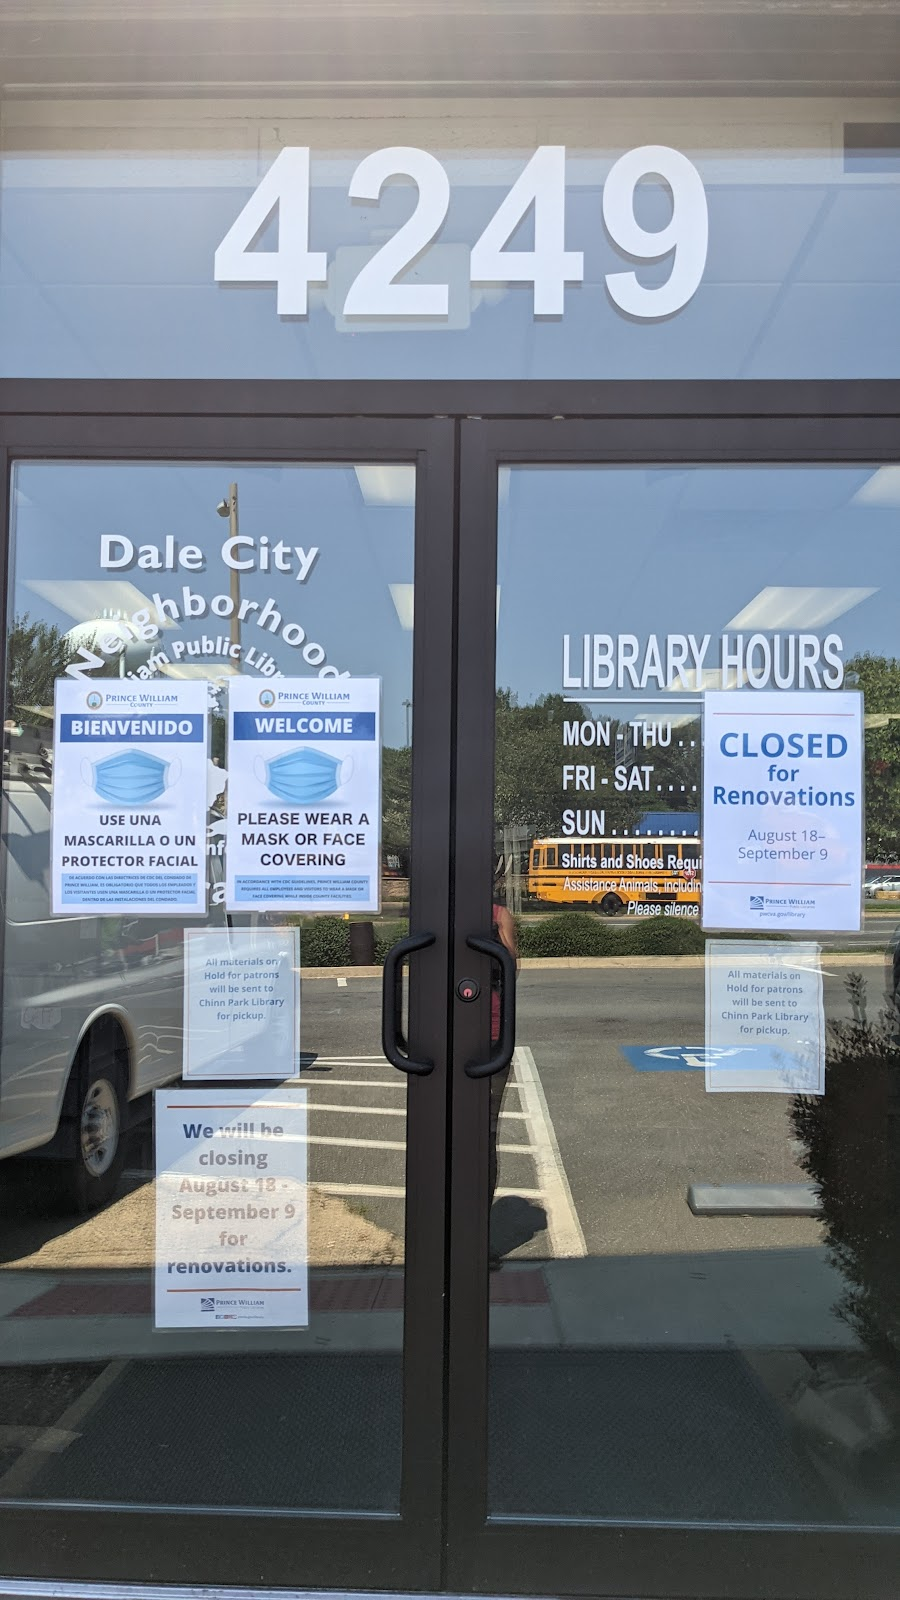 Dale City Library - library  | Photo 3 of 10 | Address: 4249 Dale Blvd, Dale City, VA 22193, USA | Phone: (703) 792-5670